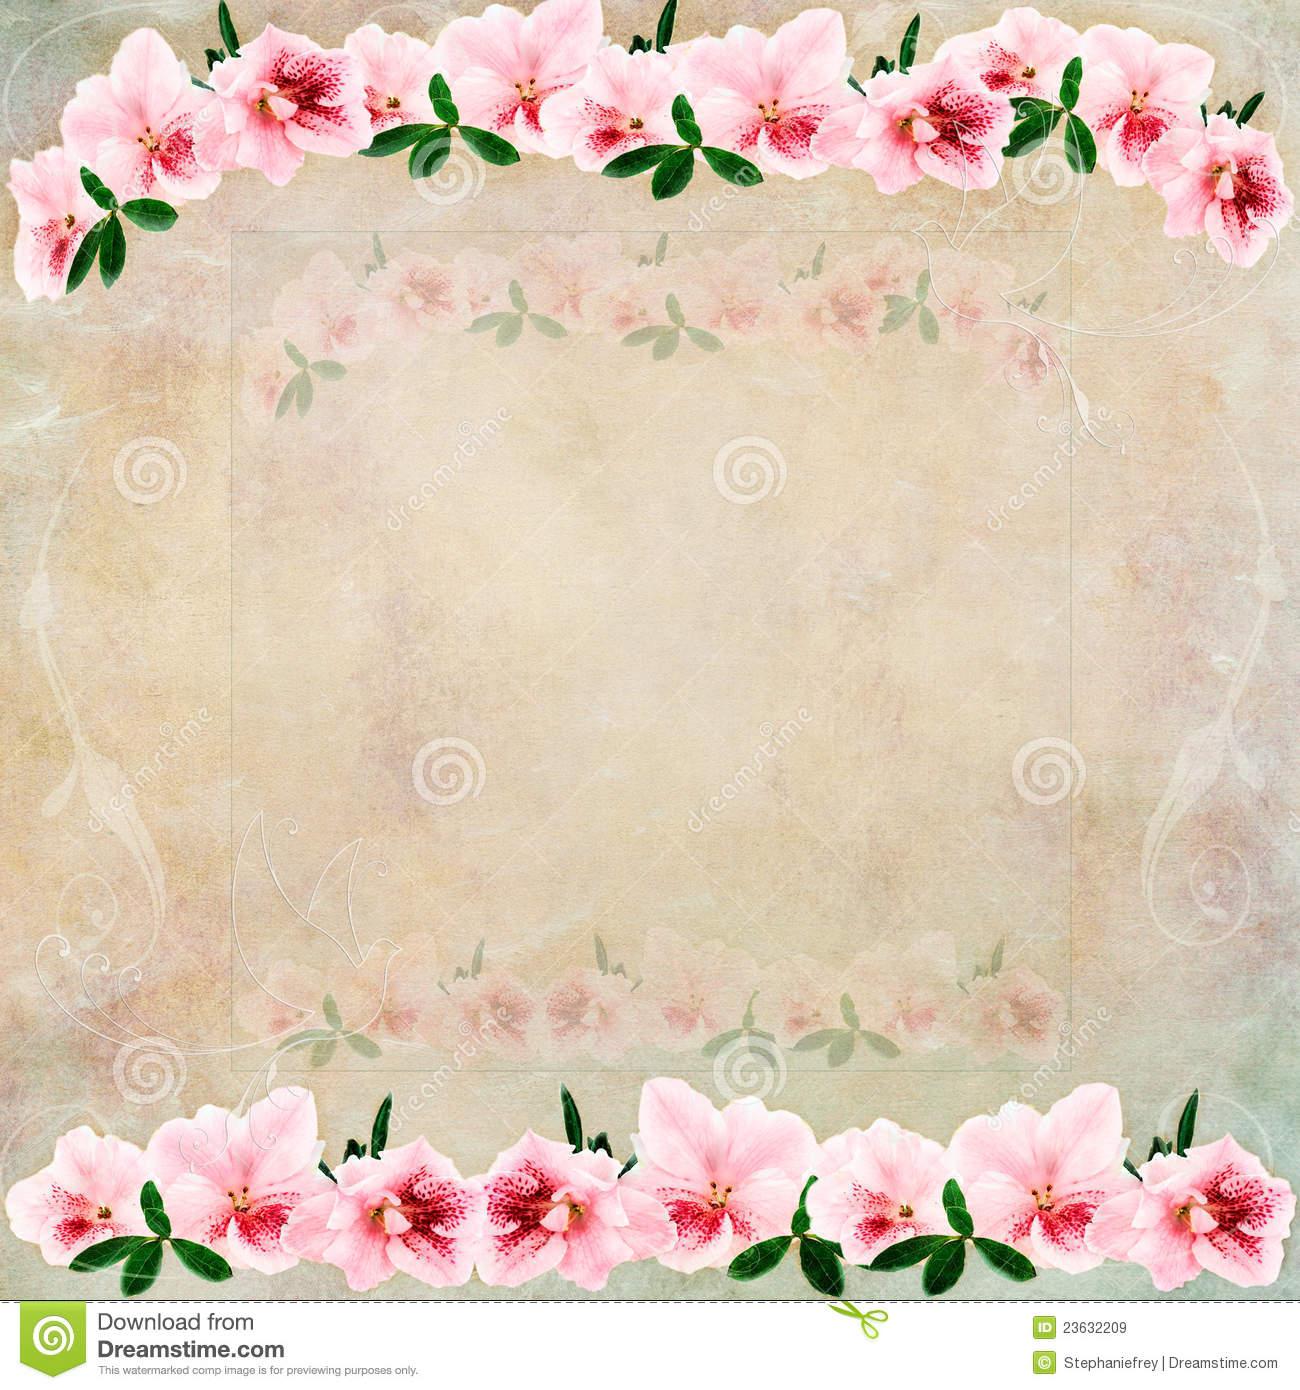 Vintage floral images free picture black and white download Vintage Floral Background Royalty Free Stock Images - Image: 23632209 picture black and white download